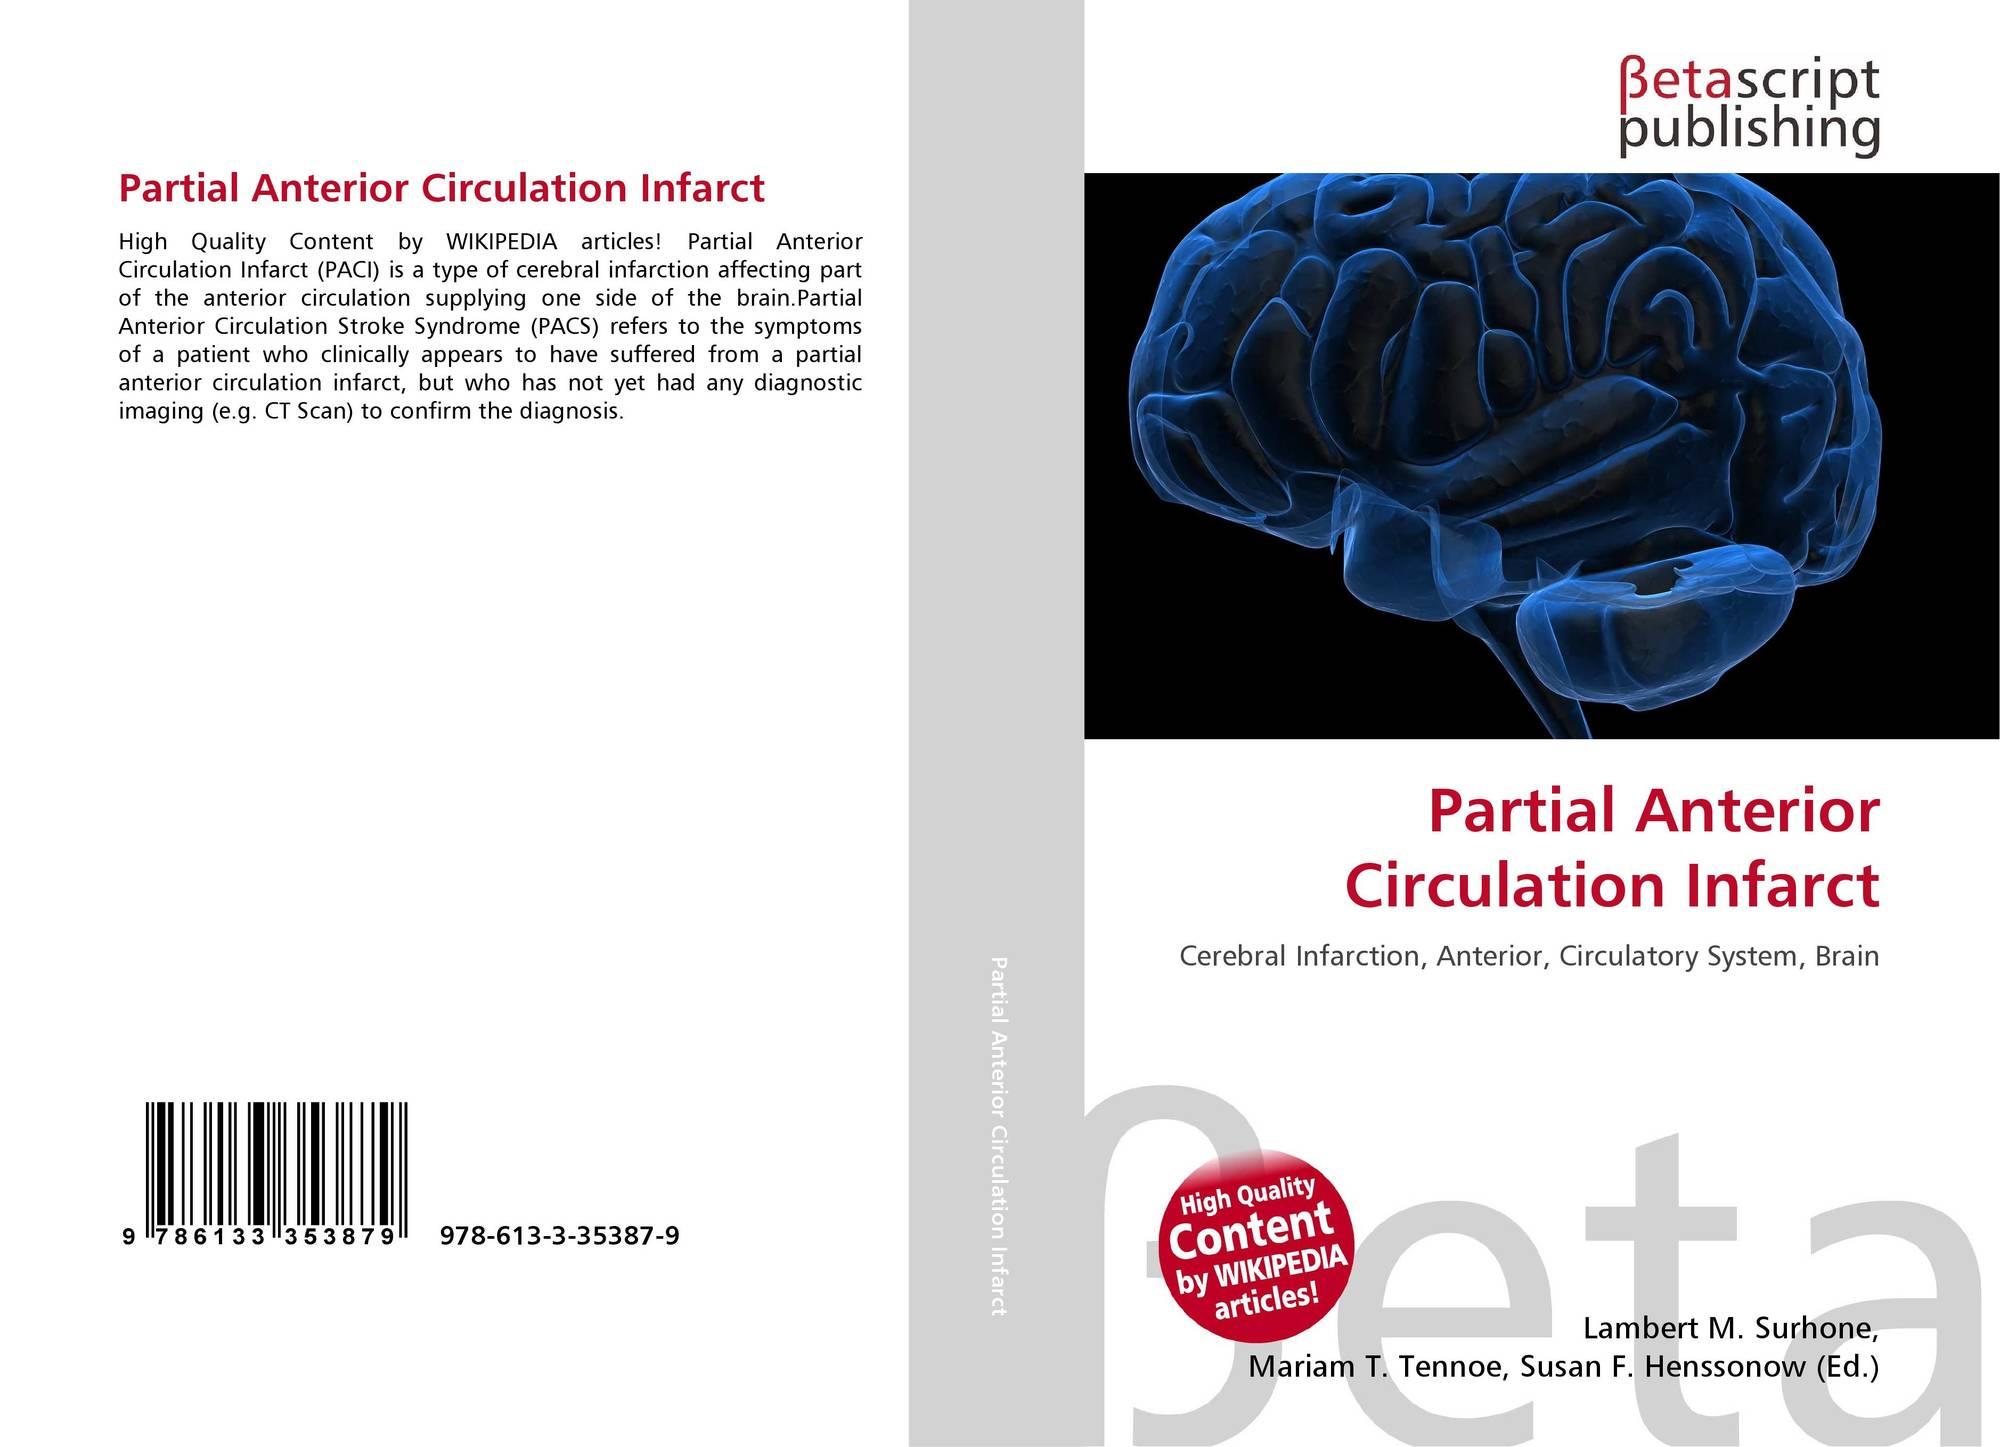 Partial Anterior Circulation Infarct, 40 40 40 4054087 40 ...